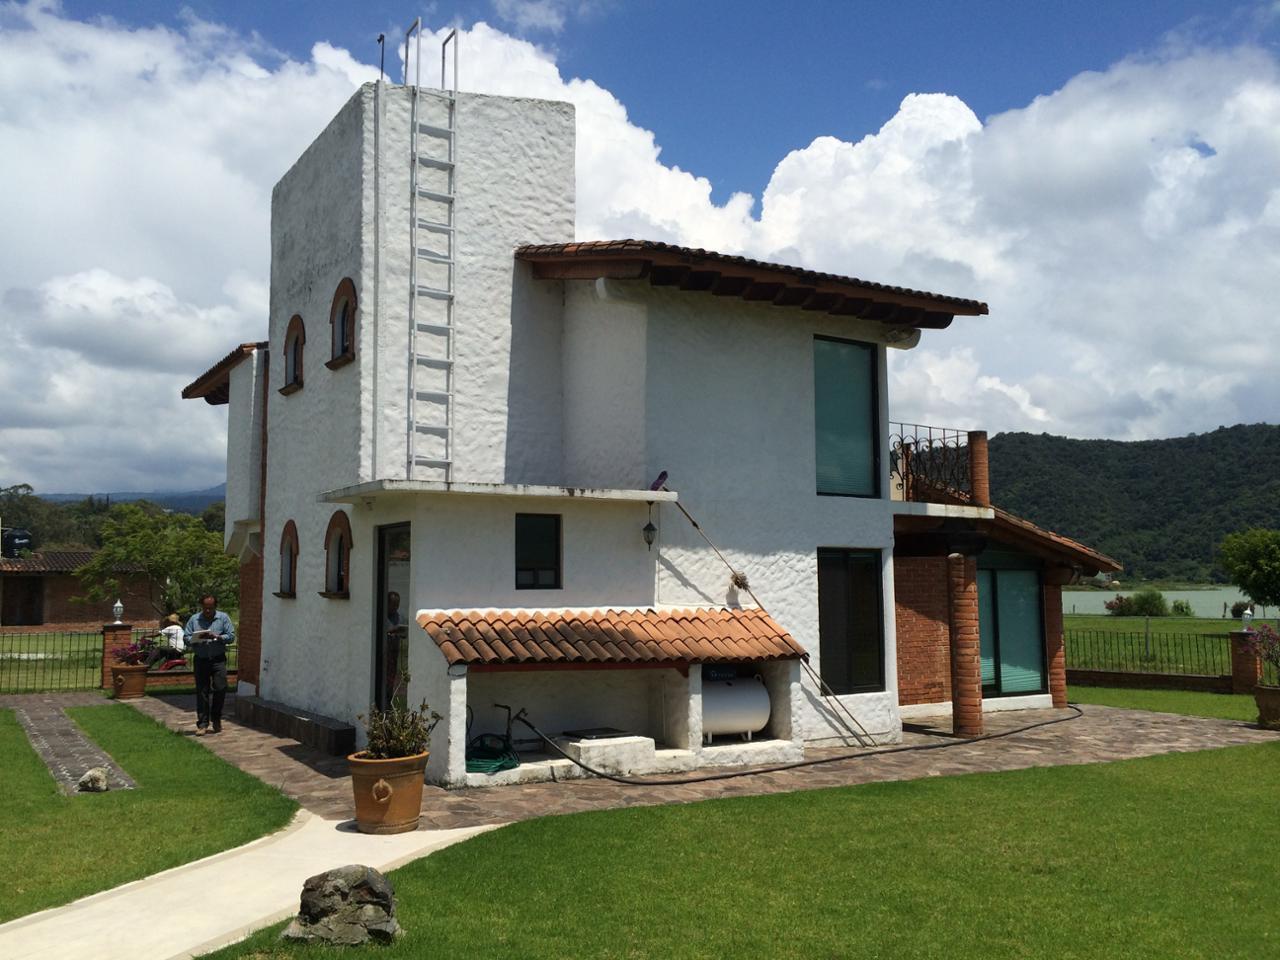 Venta casa en valle de bravo m xico cs001 - Casas en llica de vall ...